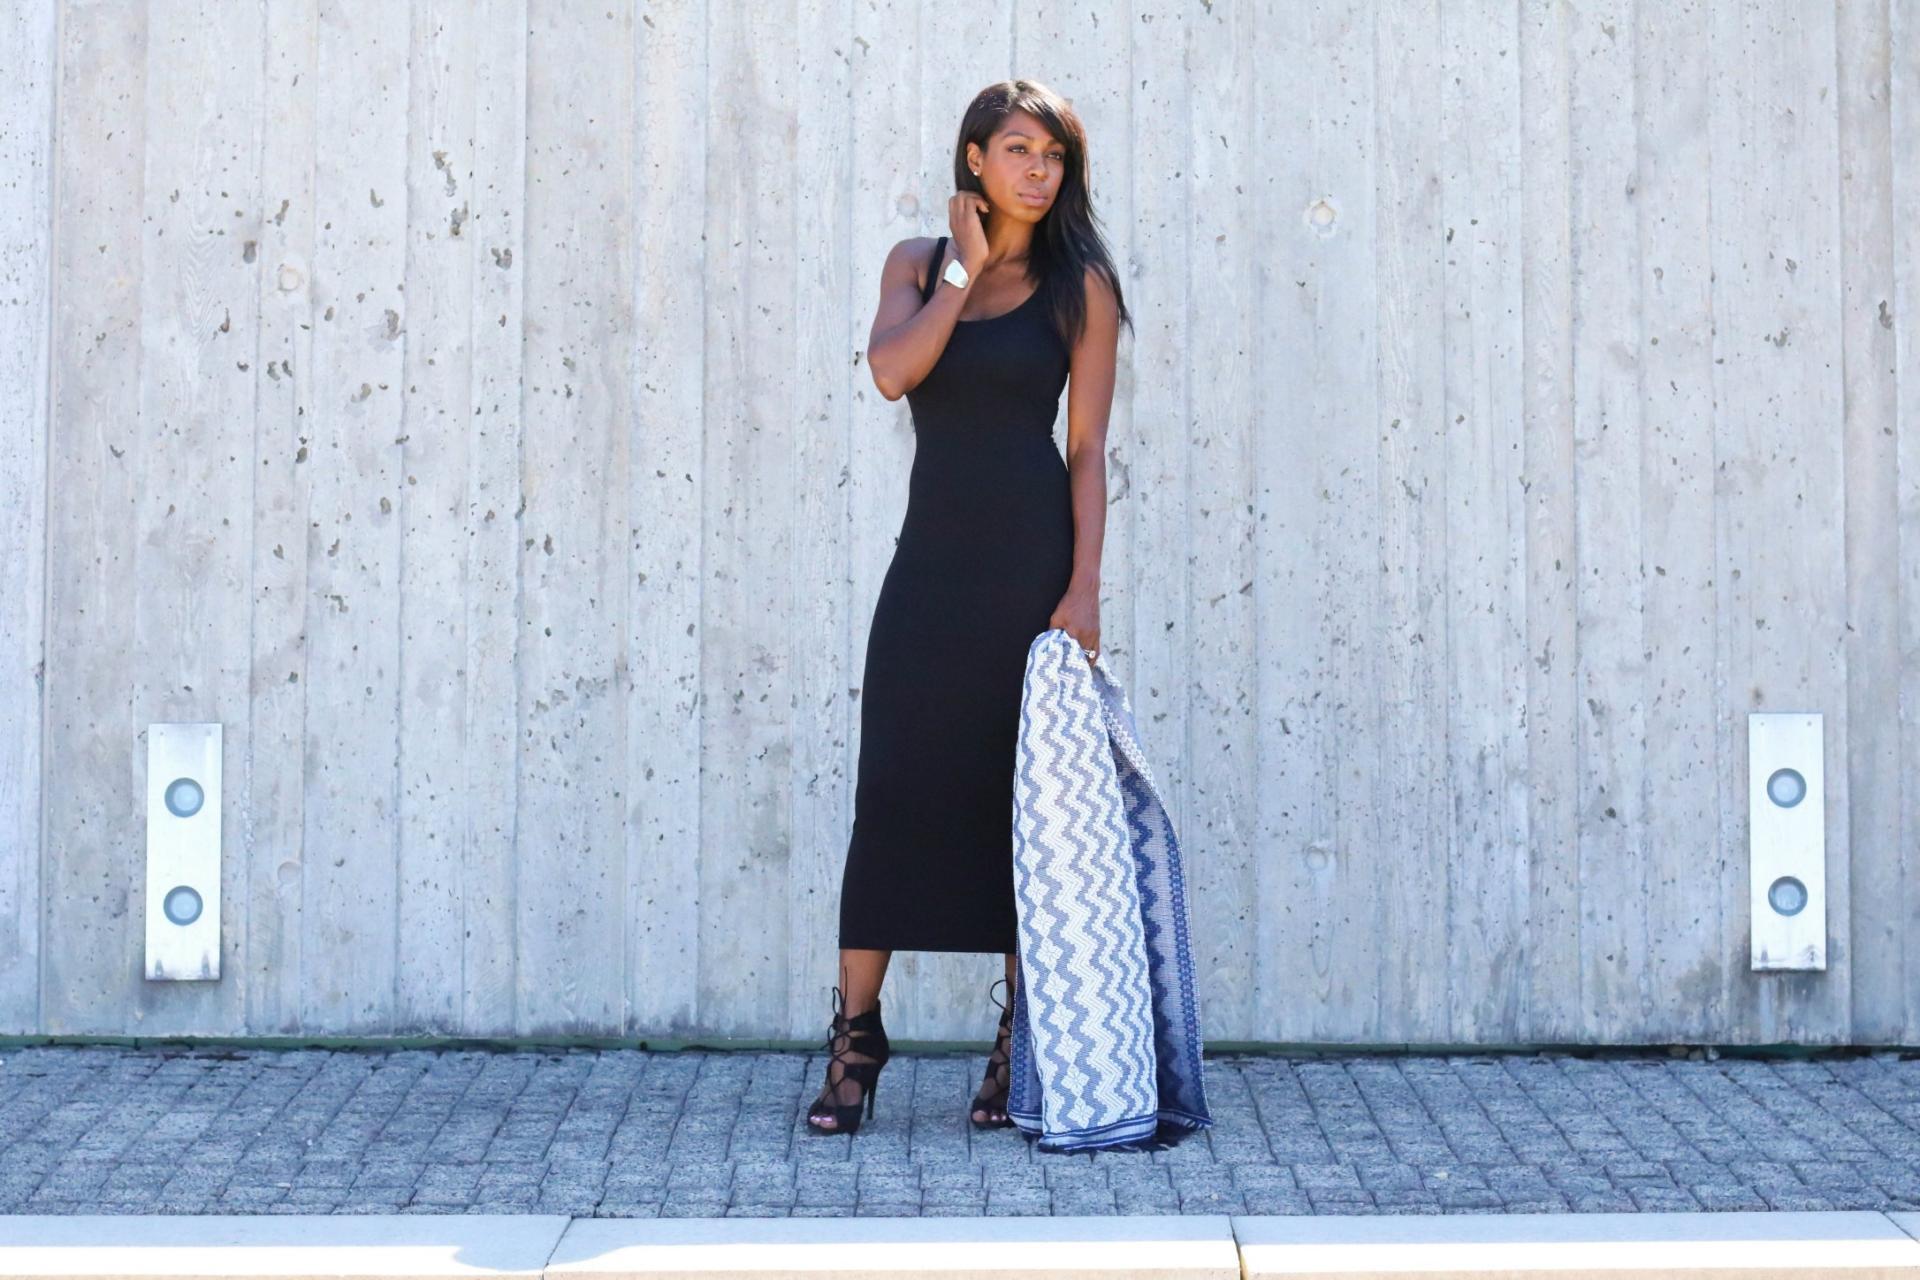 Une Echarpe - Une Vie Luxury Scarves + Giveaway